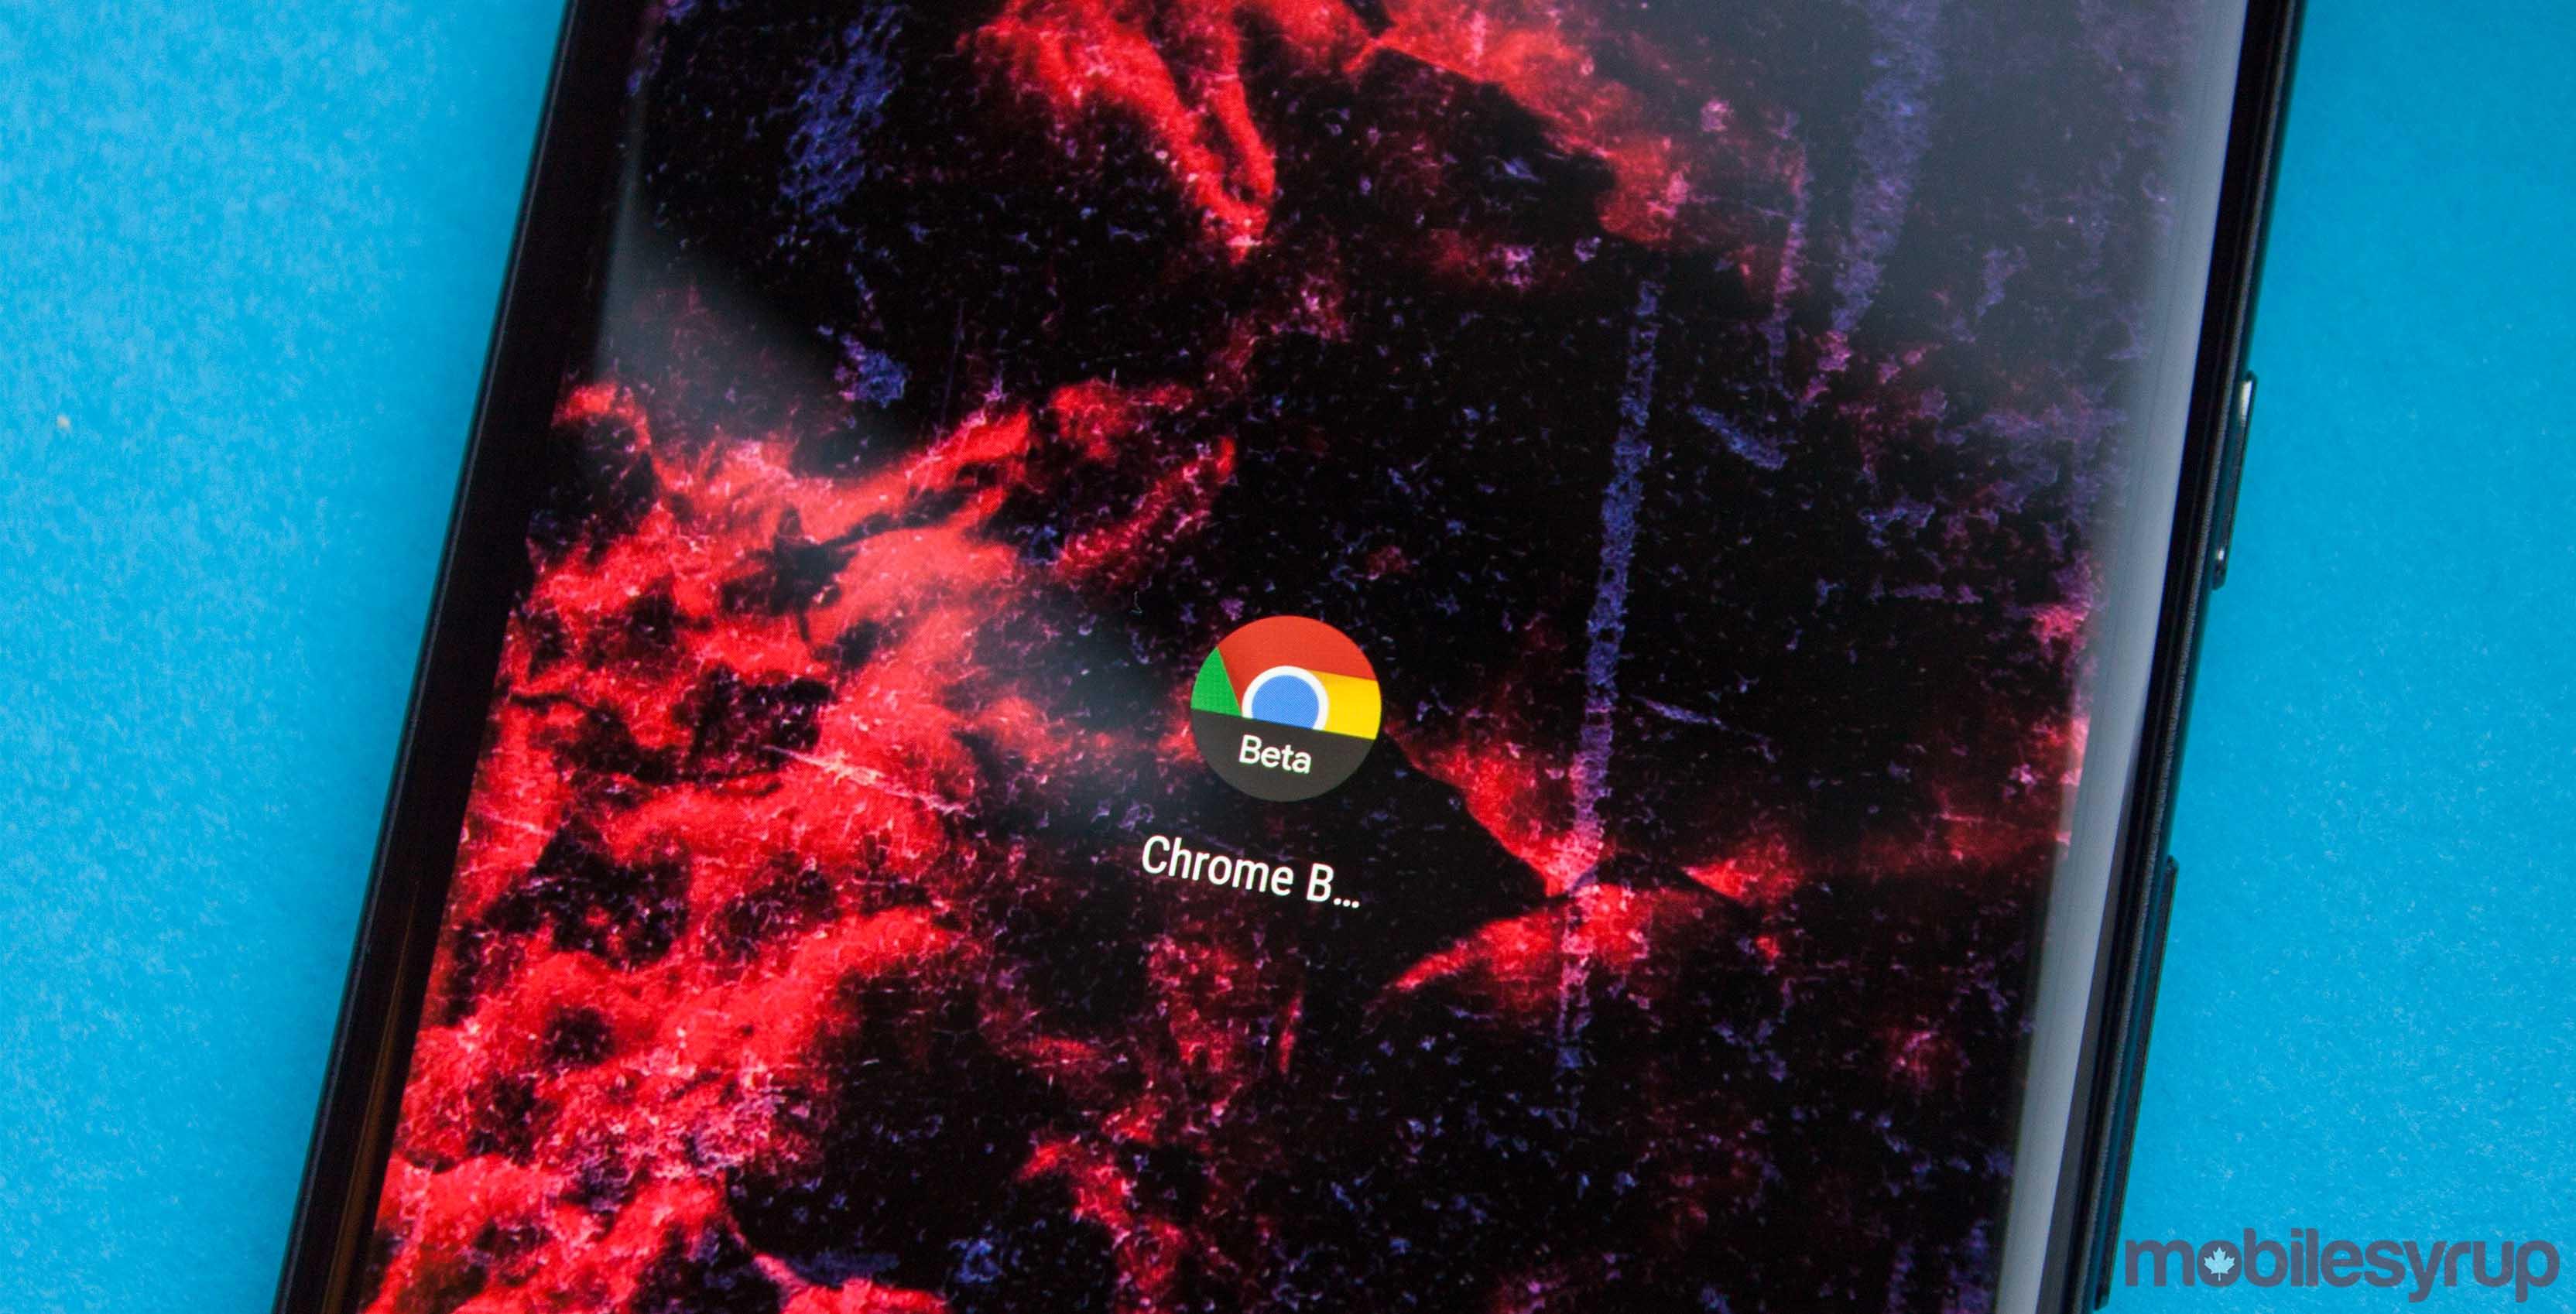 Chrome Beta app on Android